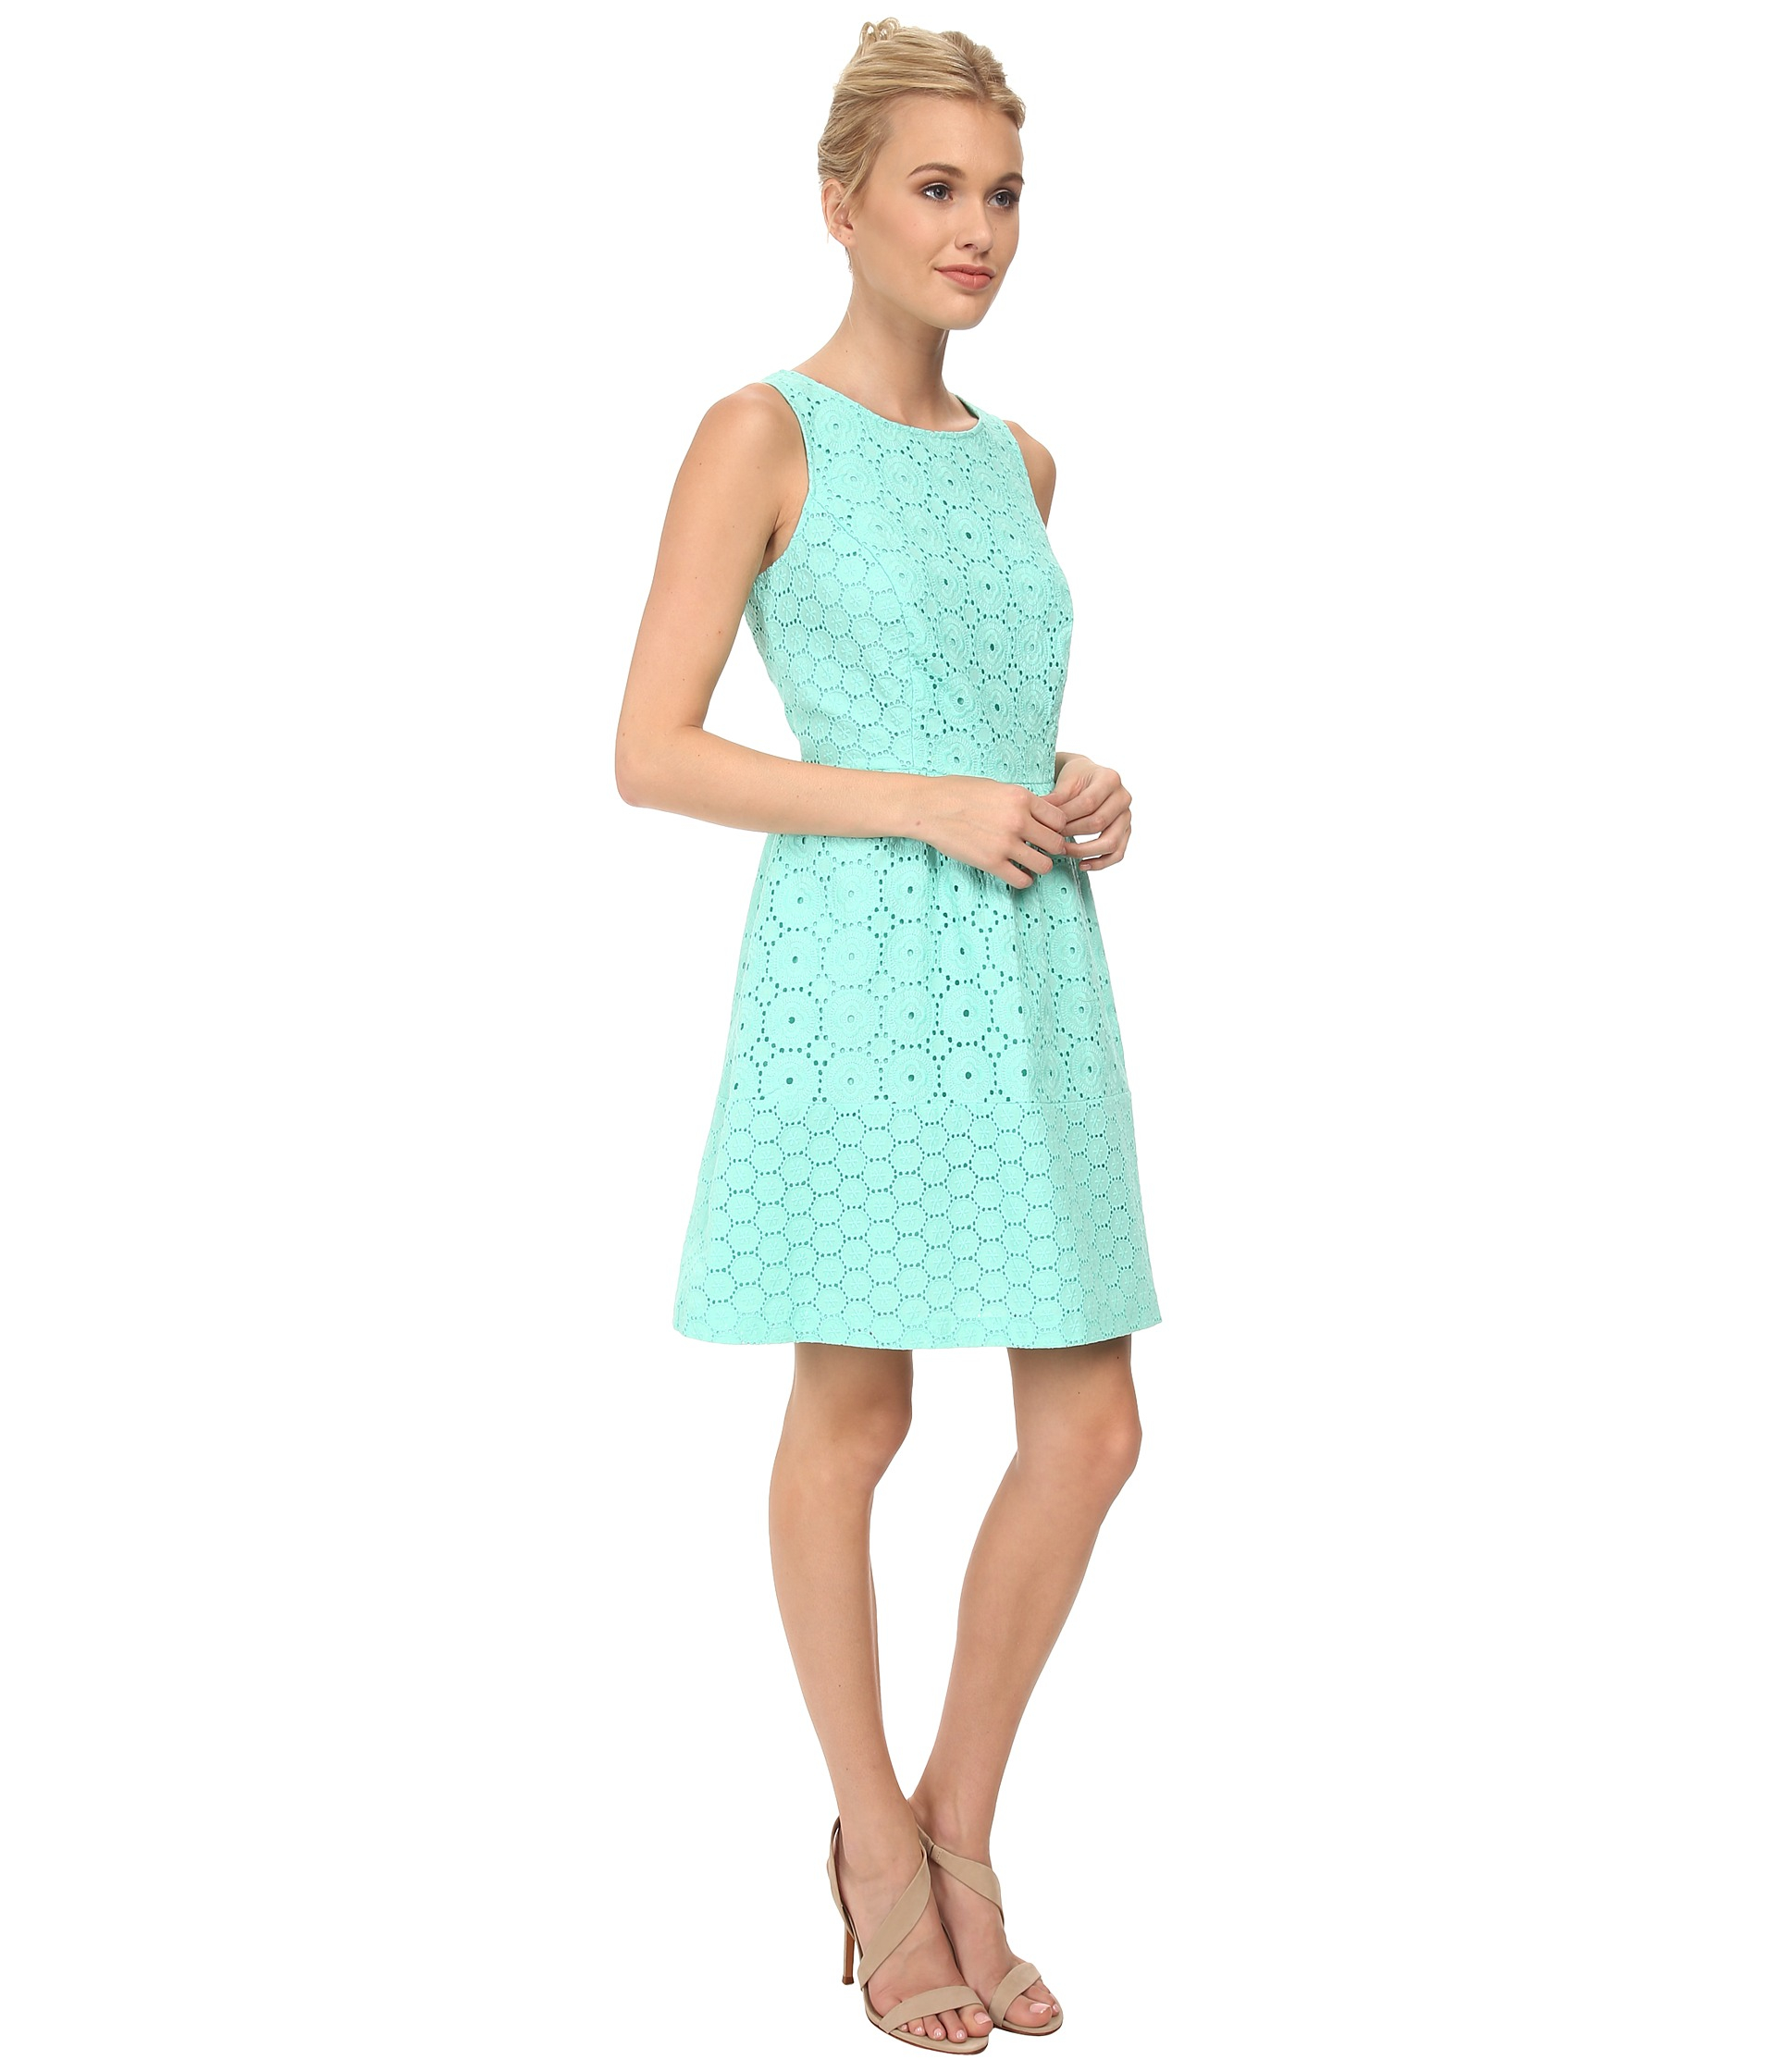 46255b97435 Kensie Embroidered Eyelet Dress Ks3K7463 in Green - Lyst